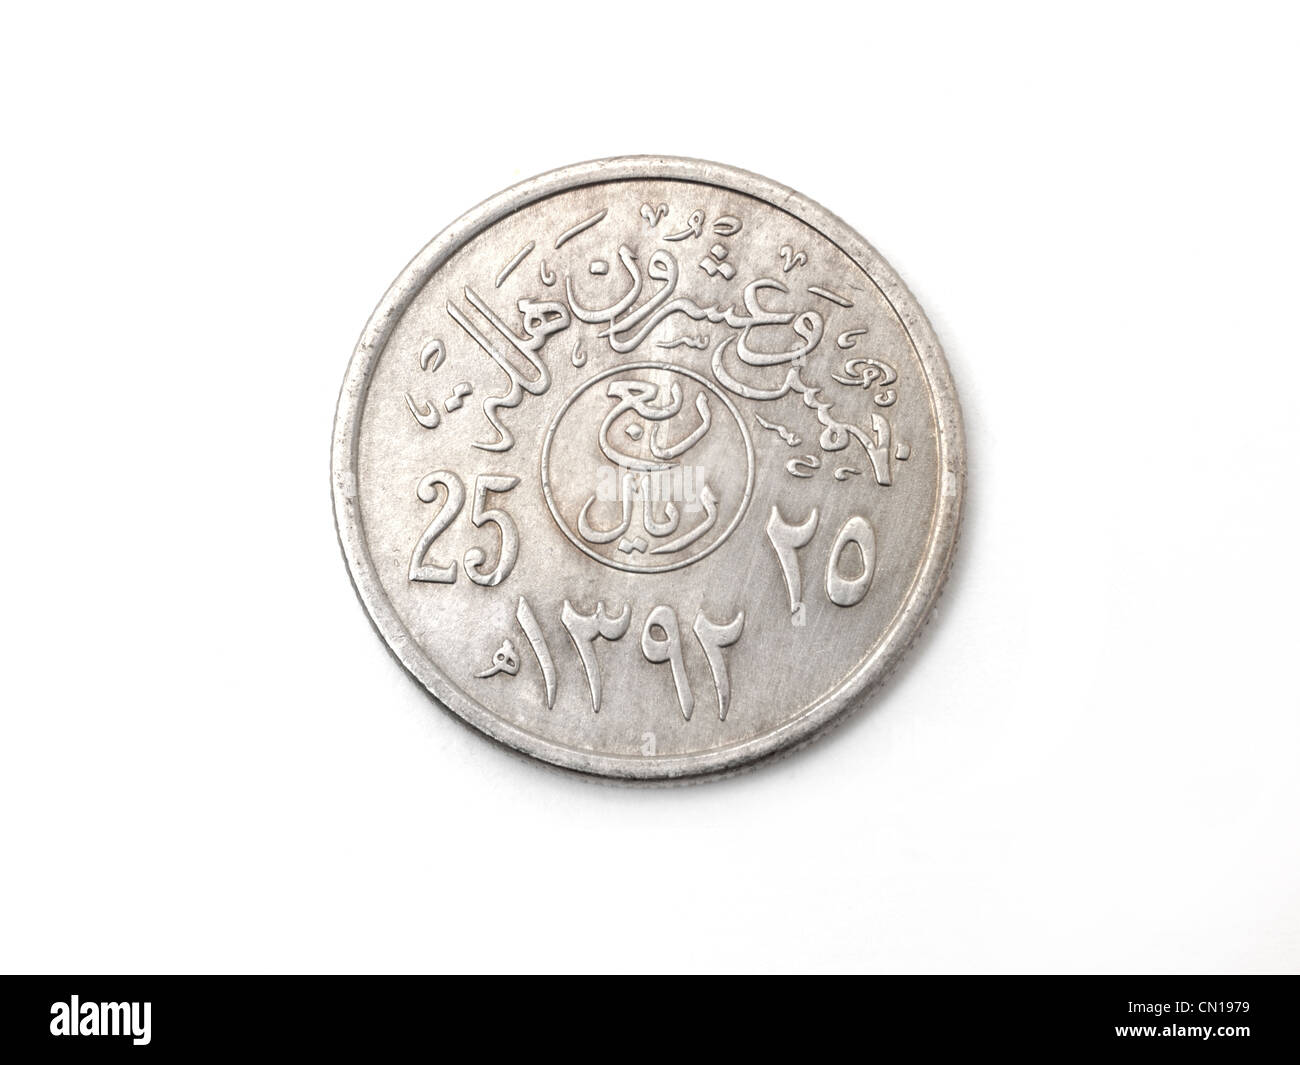 25 Halalas Saudi Arabischen Münze Vorderseite Stockfoto Bild